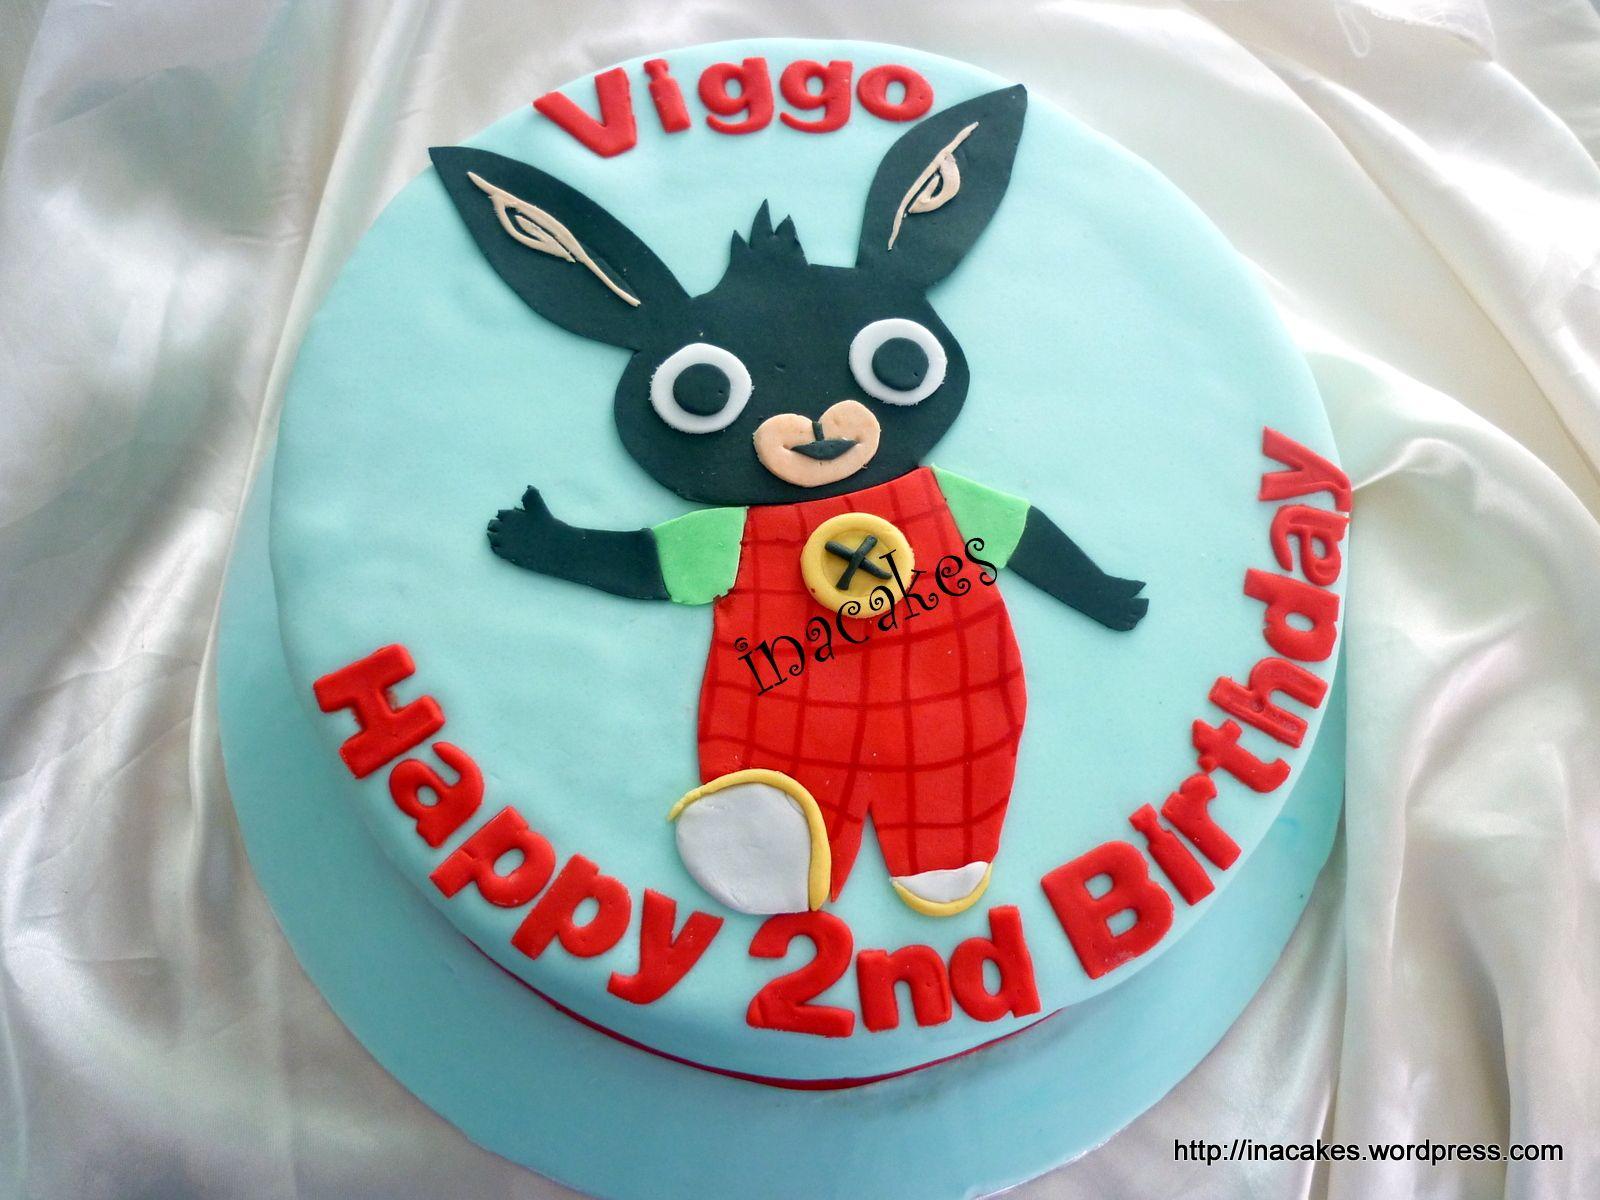 Bing 1 krlik bing Pinterest Birthday cakes Cake and Tattoo cake